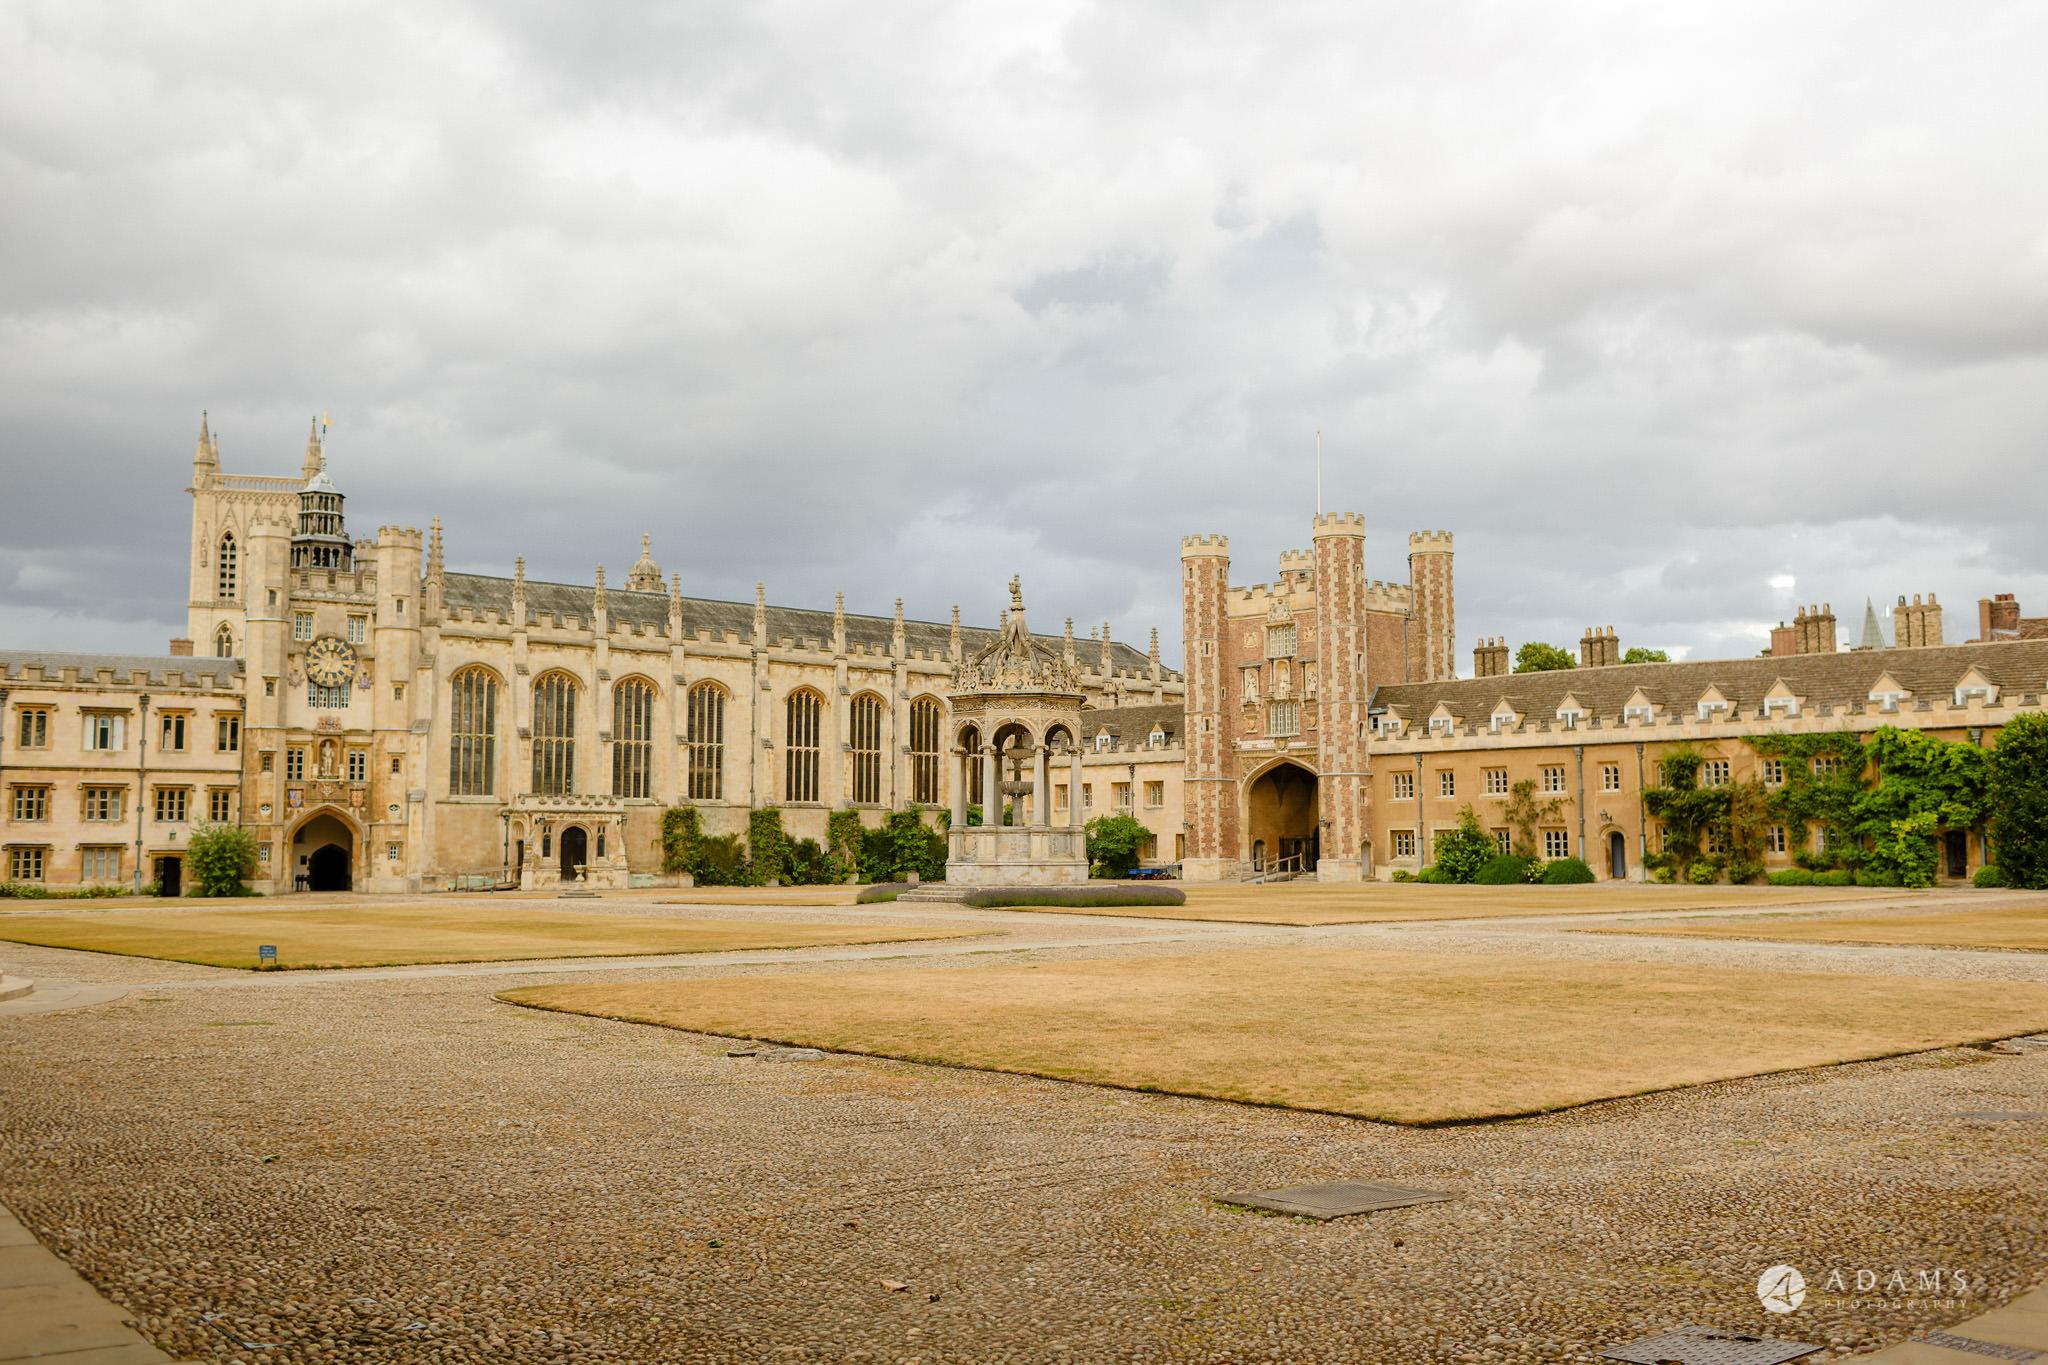 Trinity College Cambridge wedding view of the university courtyard